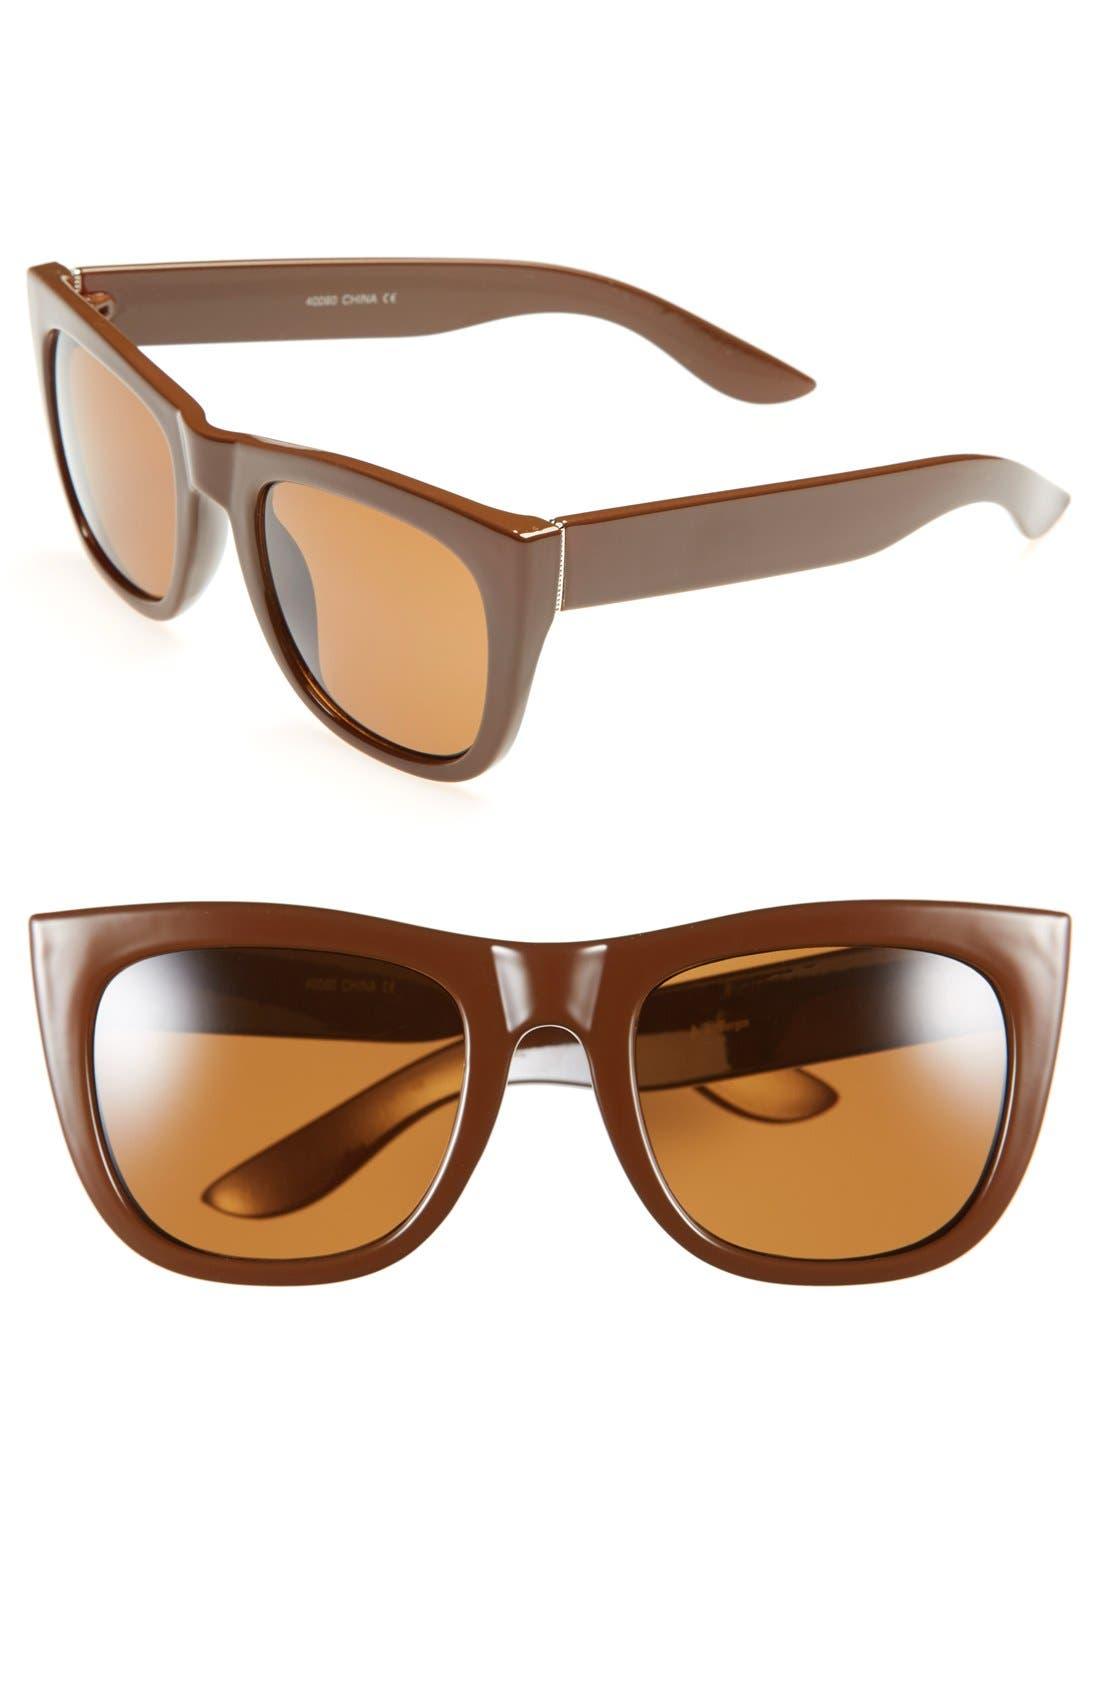 Alternate Image 1 Selected - A.J. Morgan 'Manage' 51mm Sunglasses